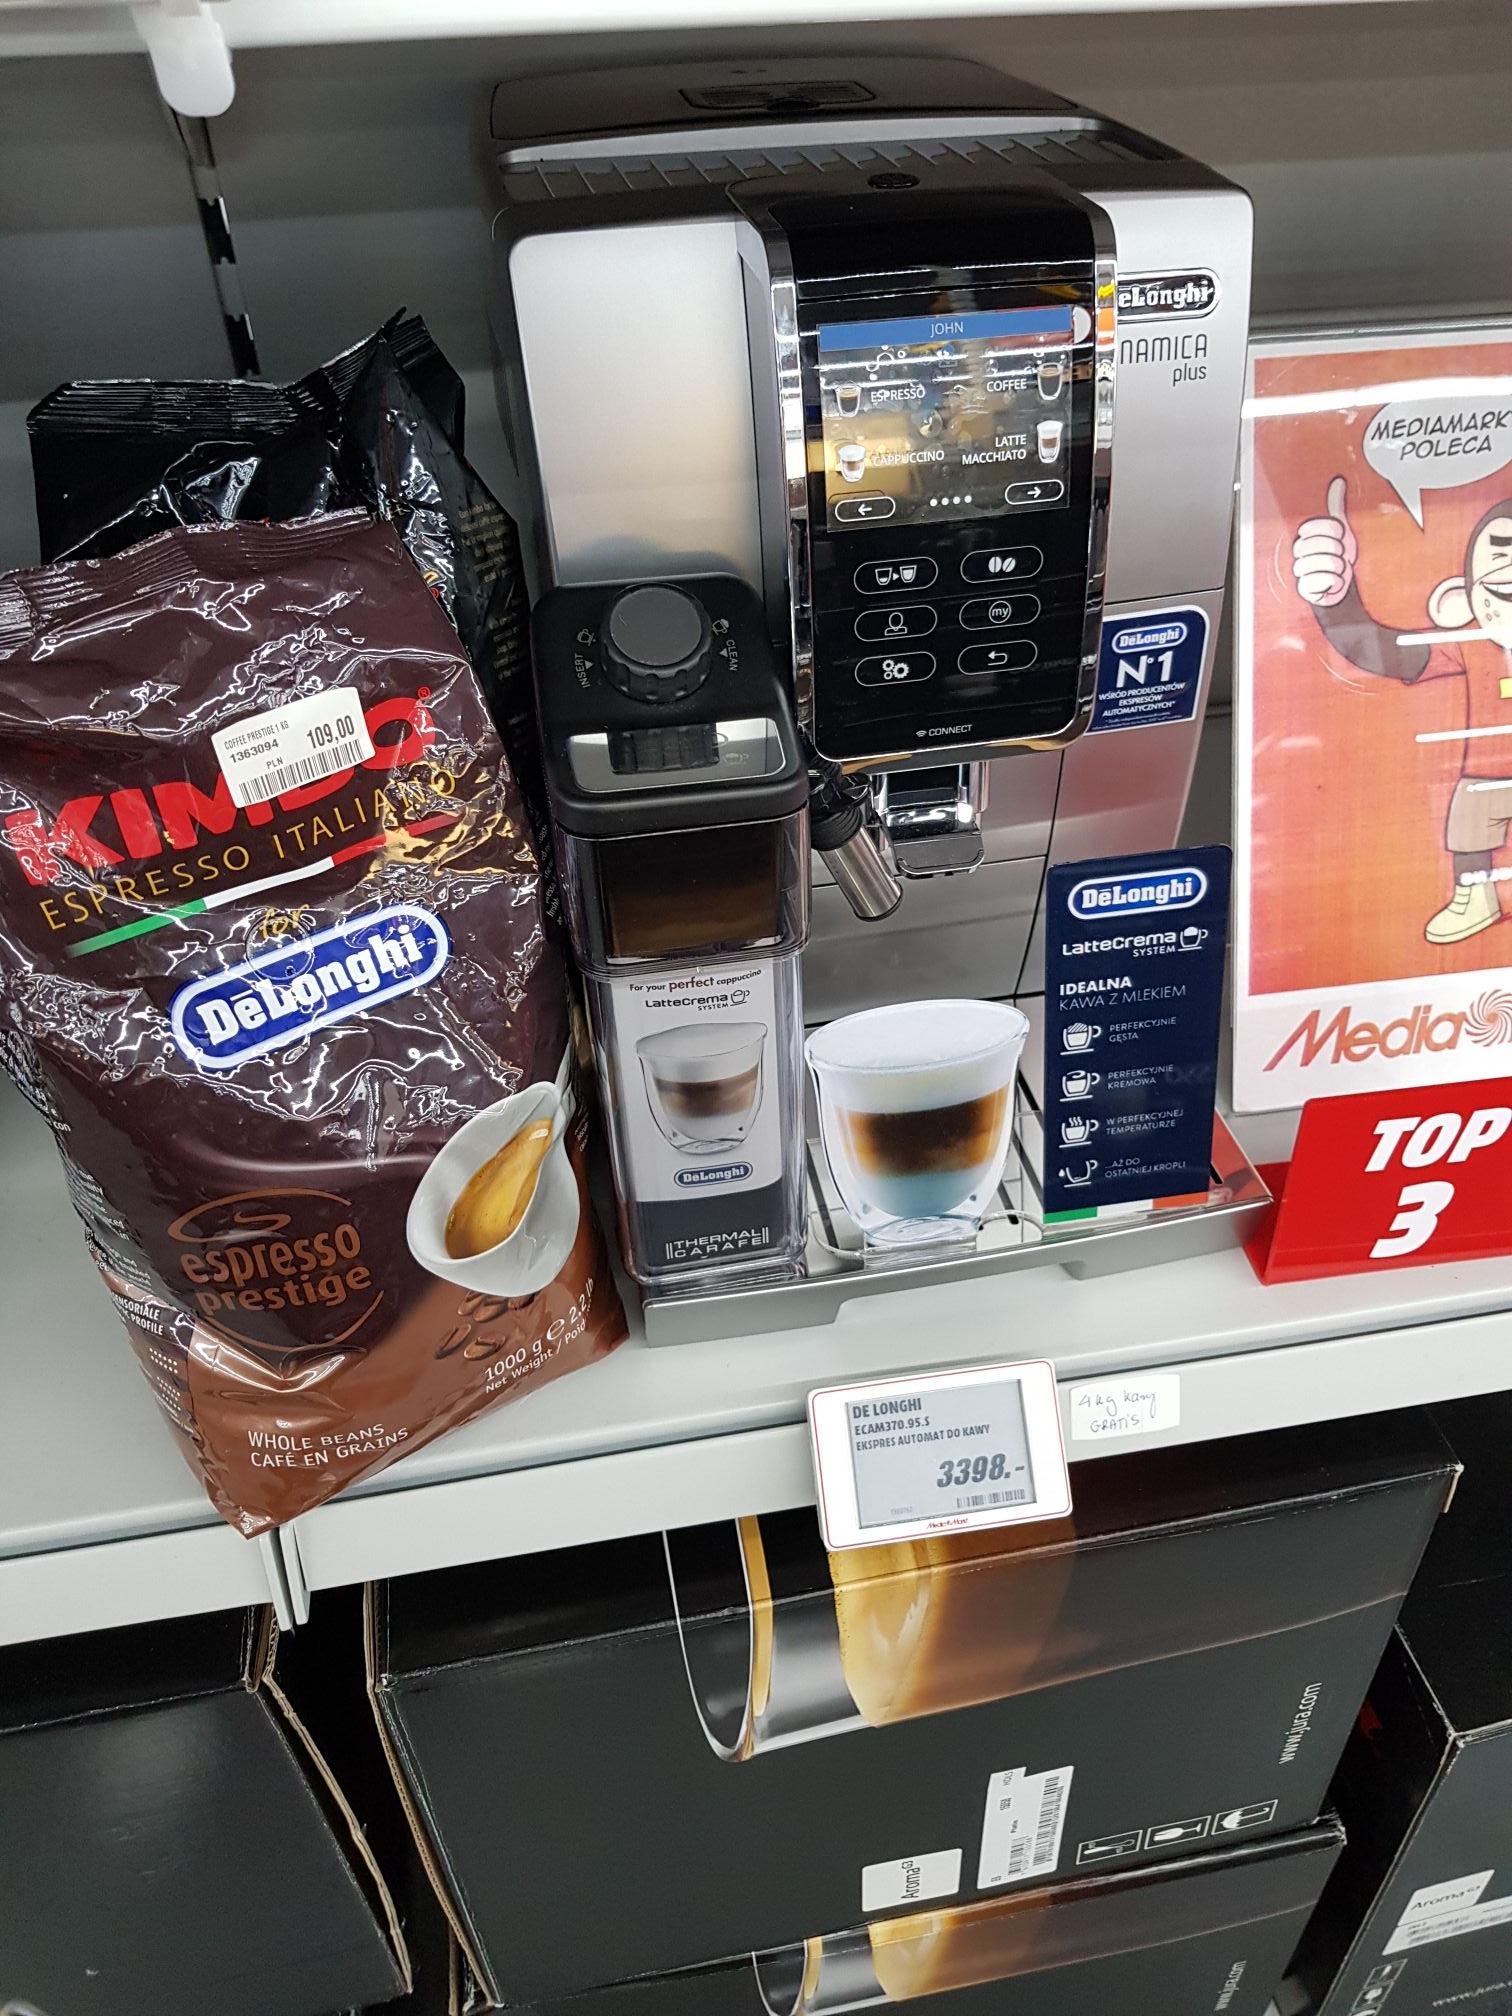 Ekspres Delonghi ECAM 370.95.S + 4kg kawy marki KIMBO